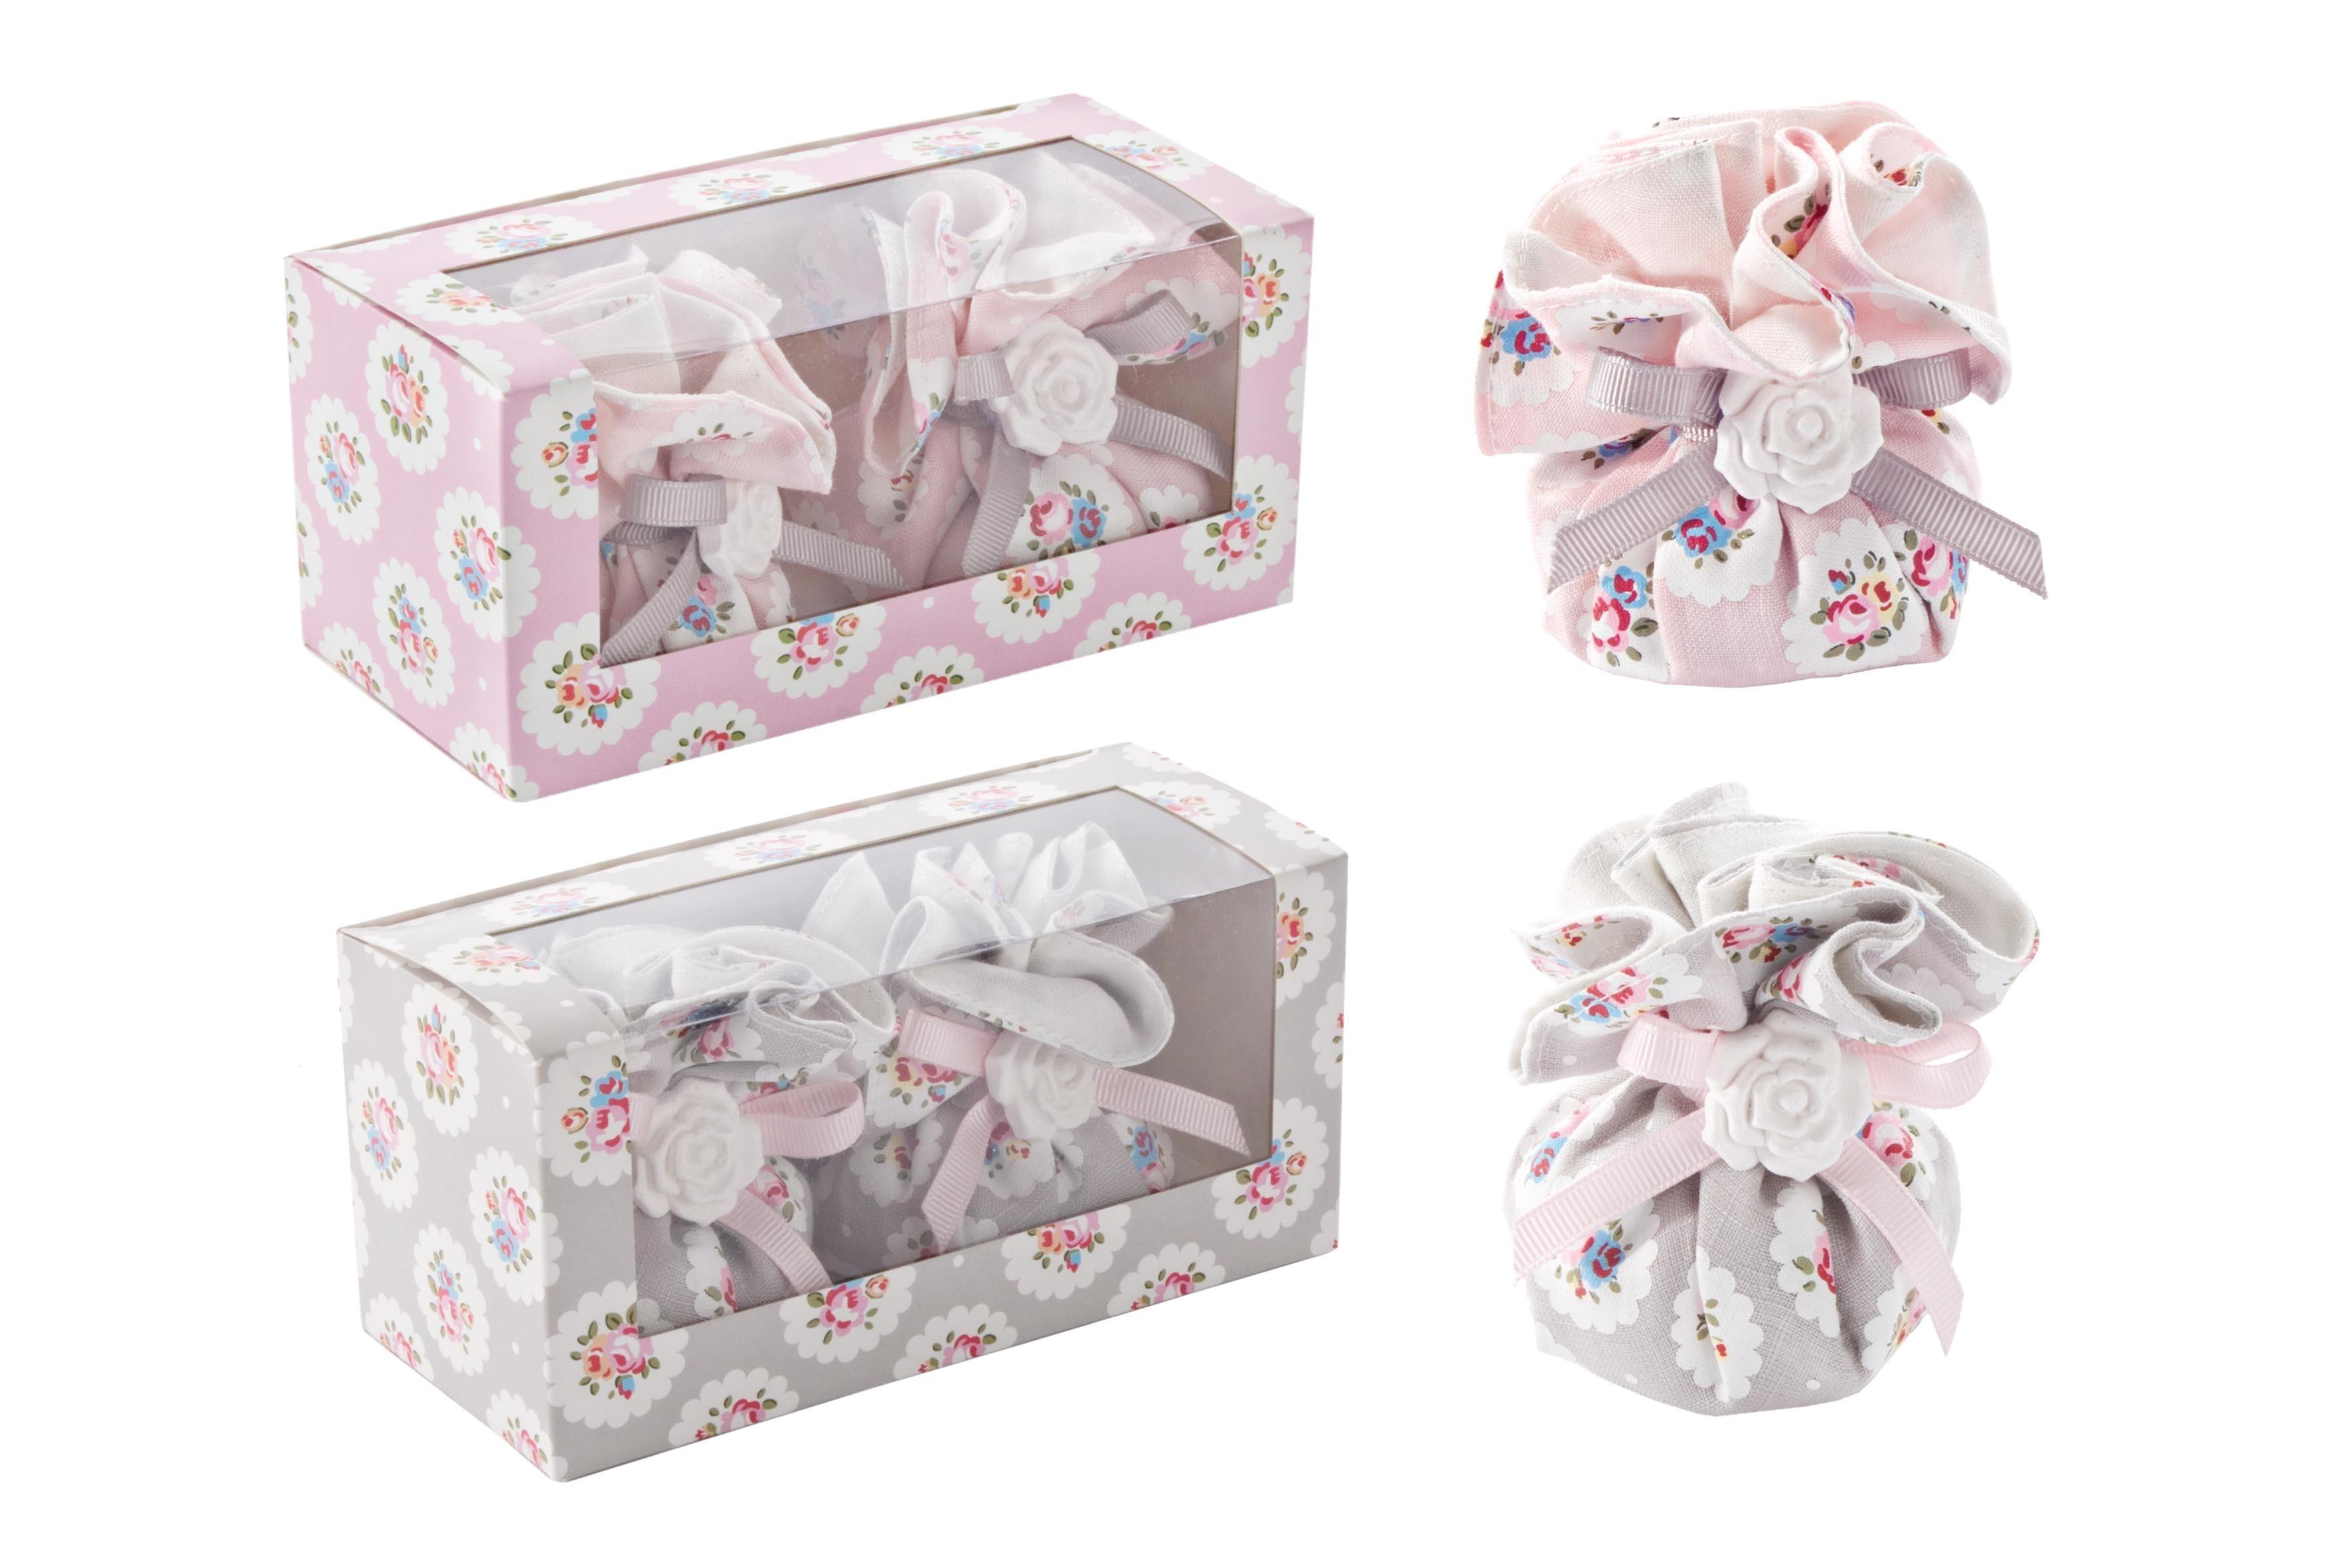 Set aromaterapie, 2 piese in cutie cadou, Vintage Rose, Modele Asortate, L15xl6,5xH7 cm imagine